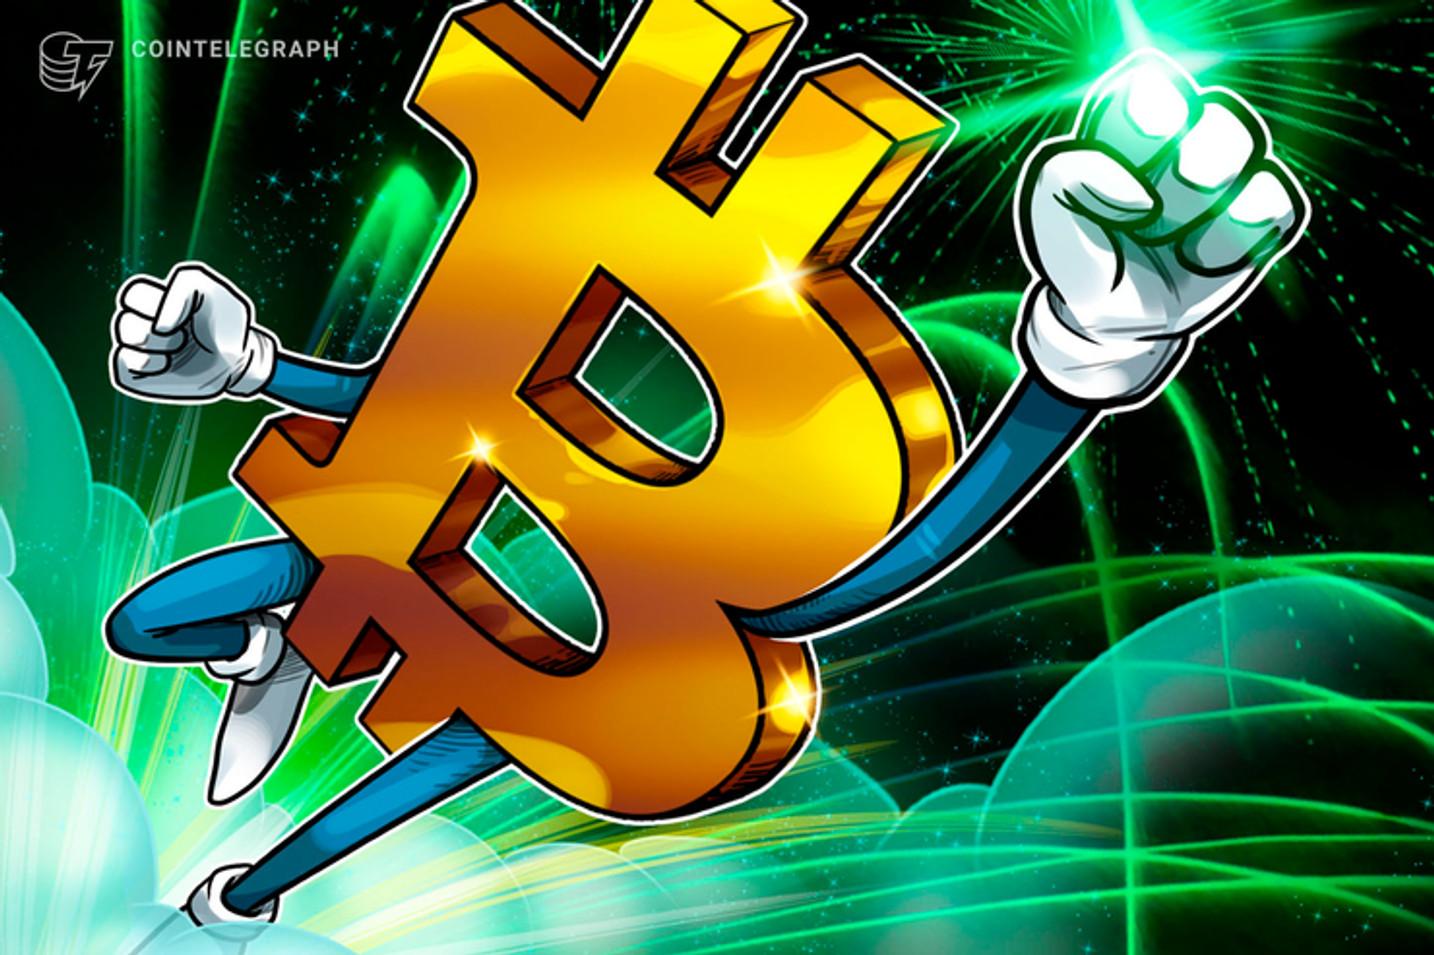 """Bitcoin volverá a valer 10.000 dólares en breve"" indica nuevo informe de Bloomberg"